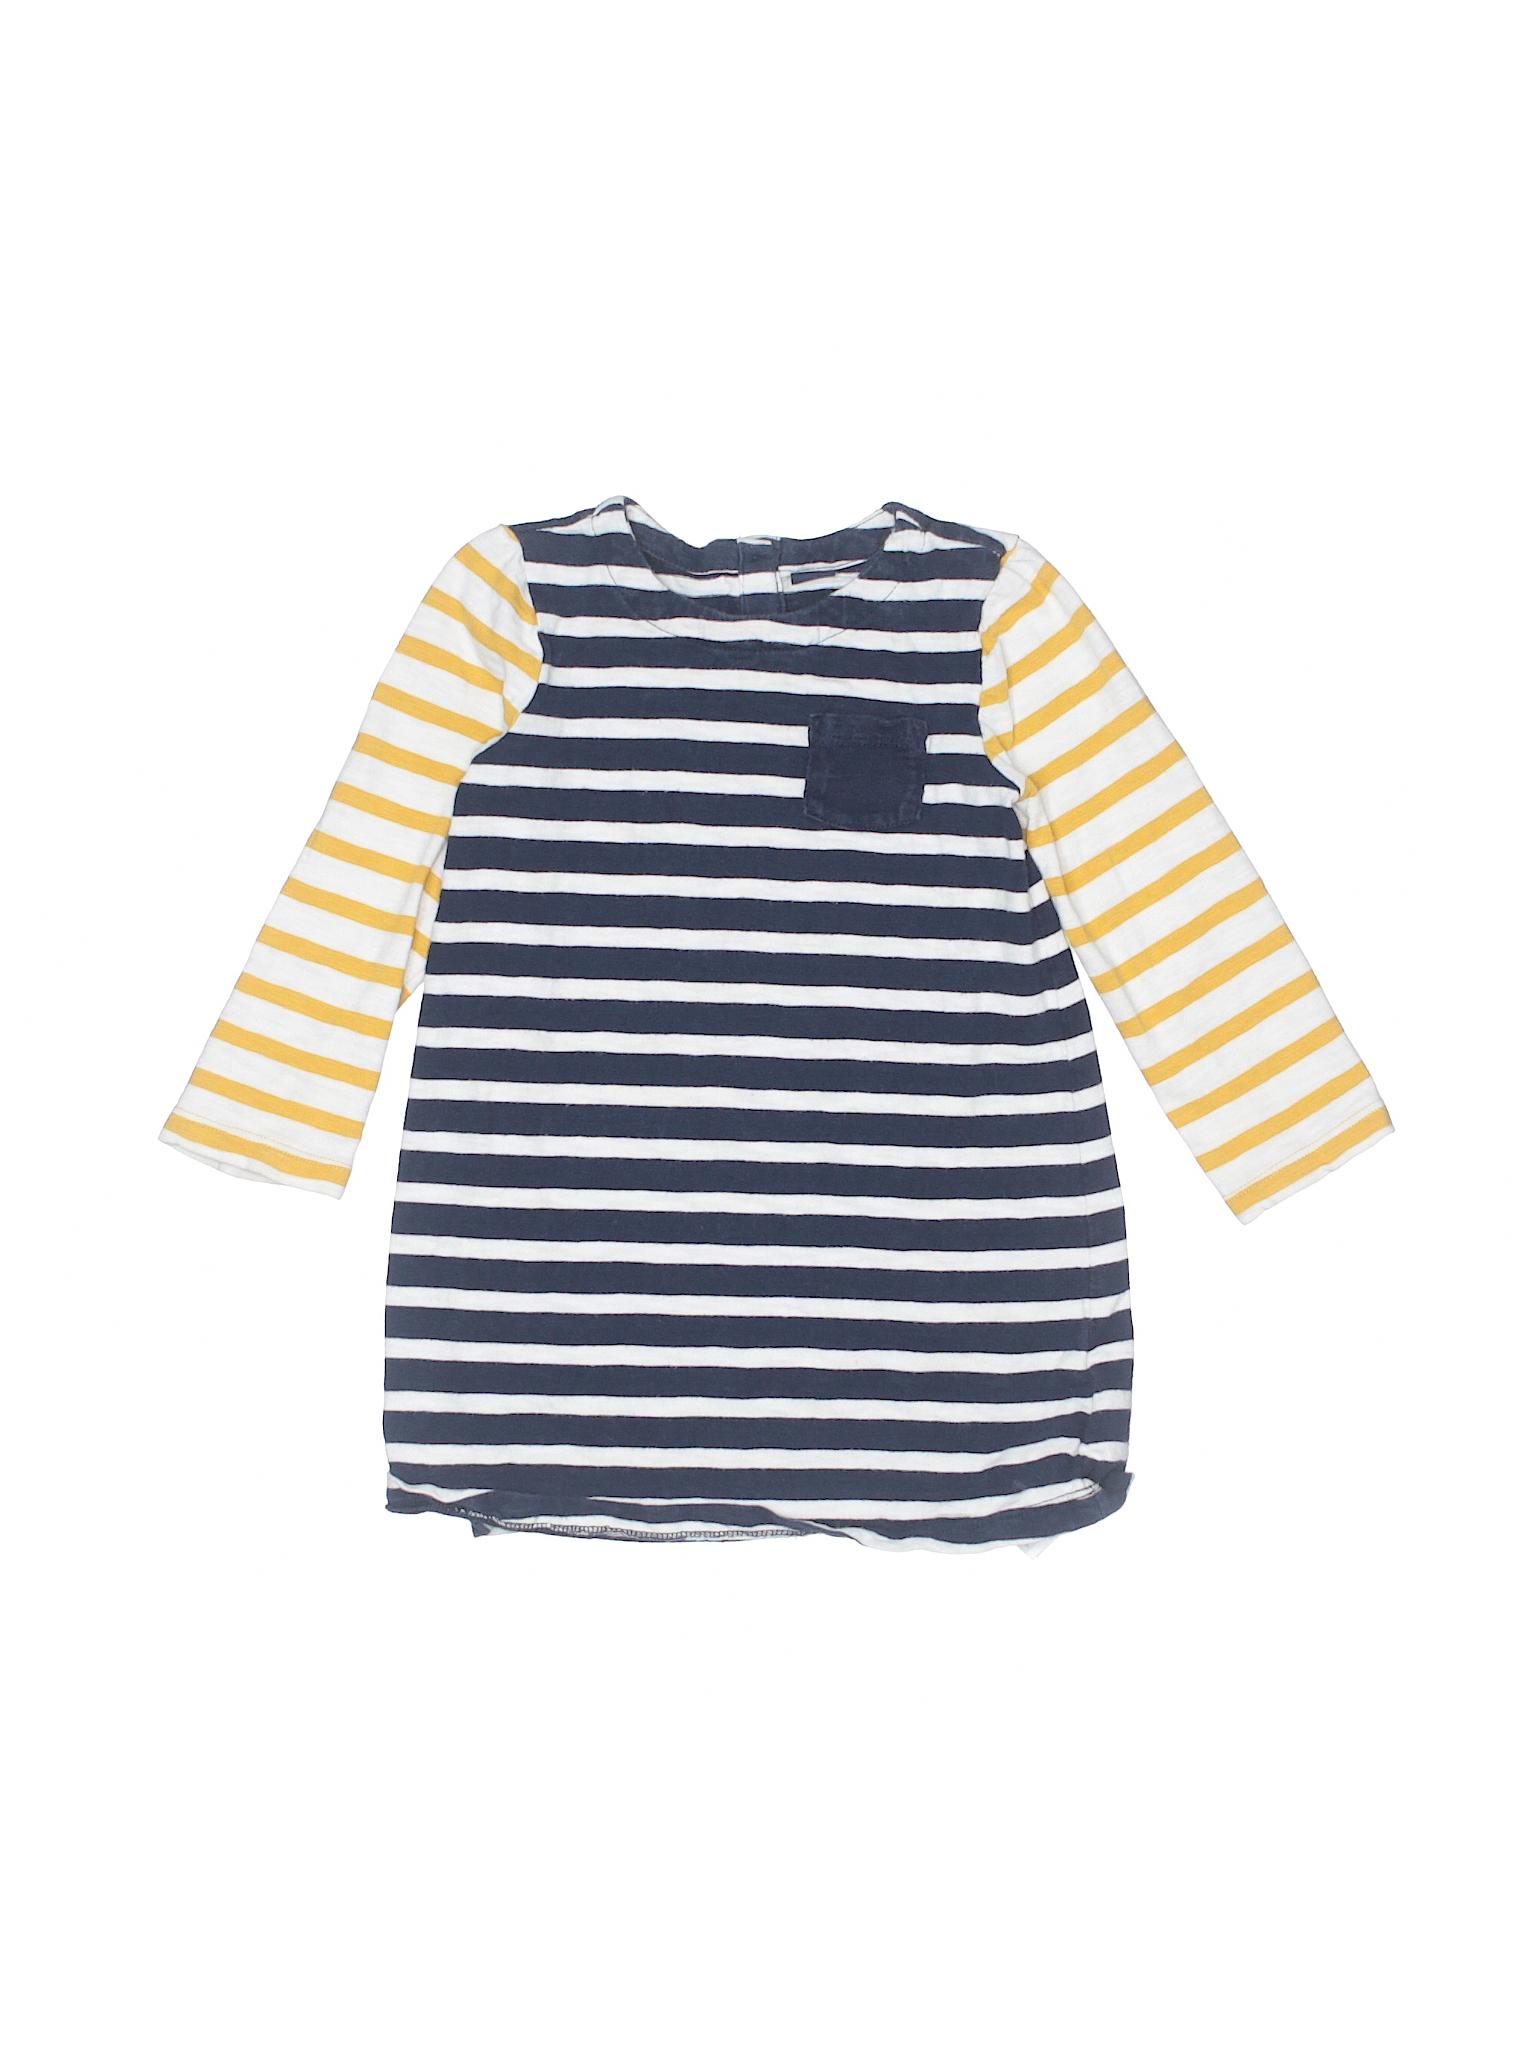 Baby Gap Cotton Stripes Dark Blue Dress Size 3T off